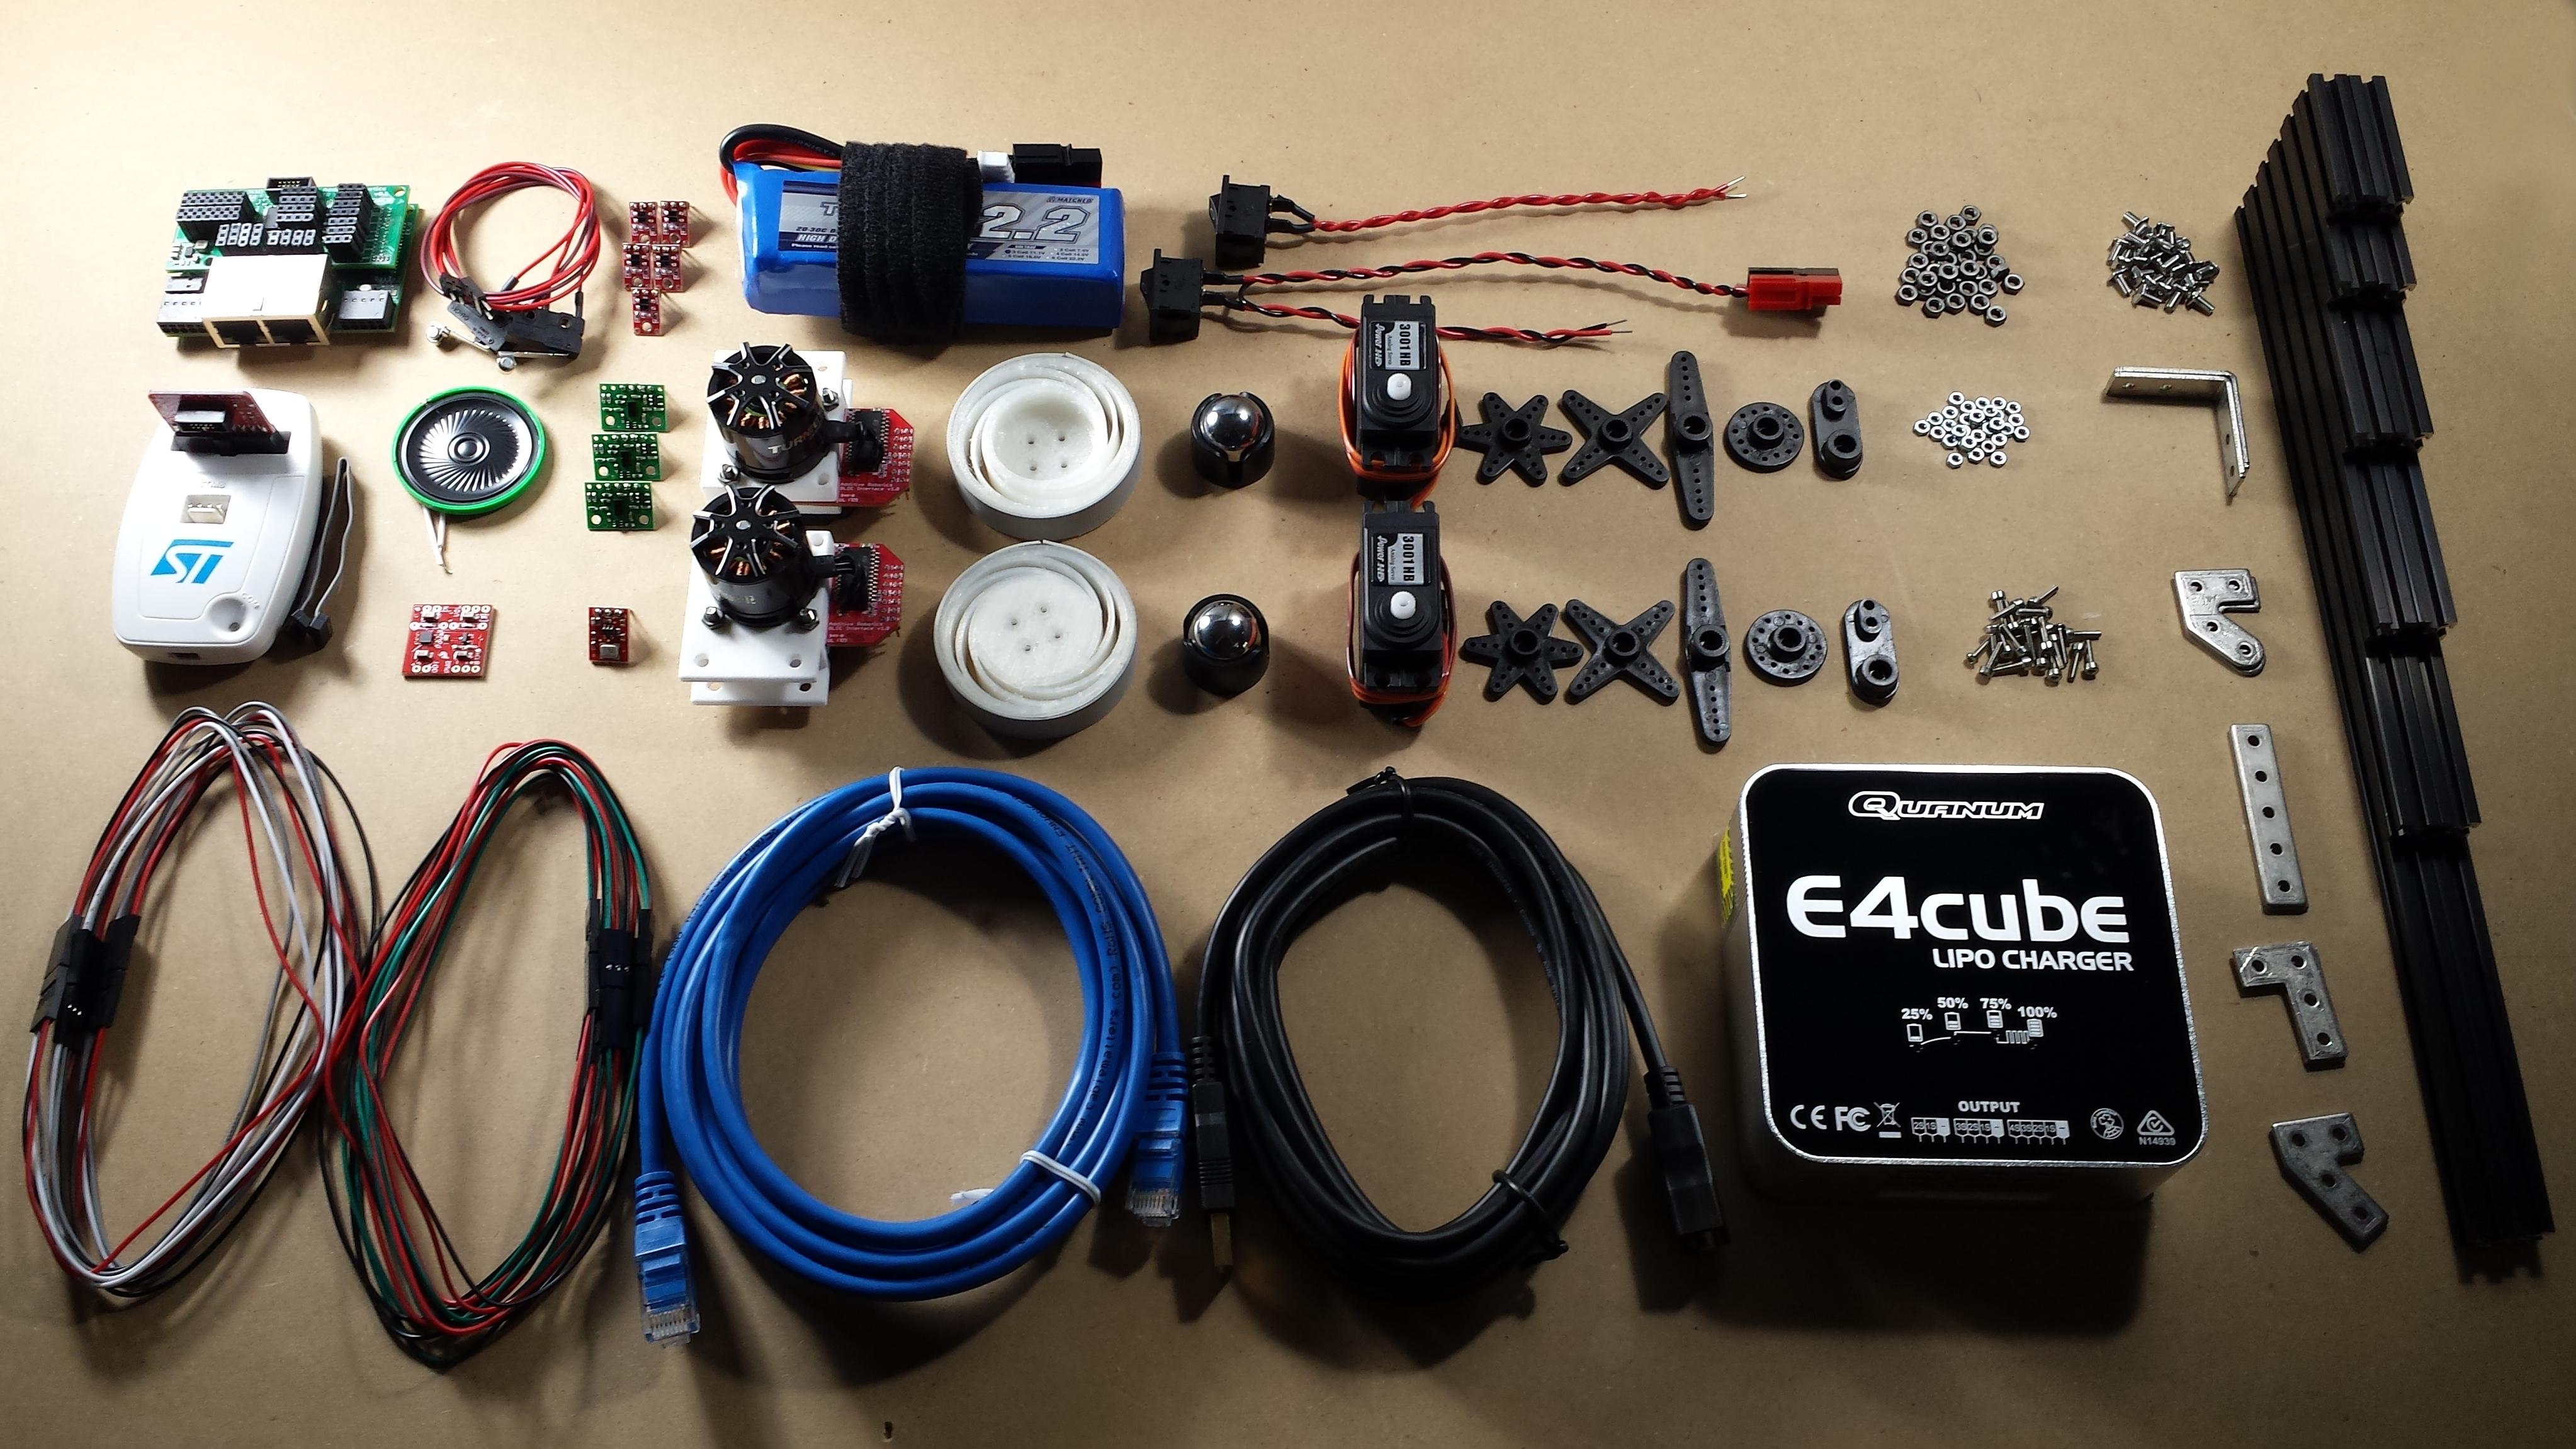 Professional Robotics Learning System Additive Robotics